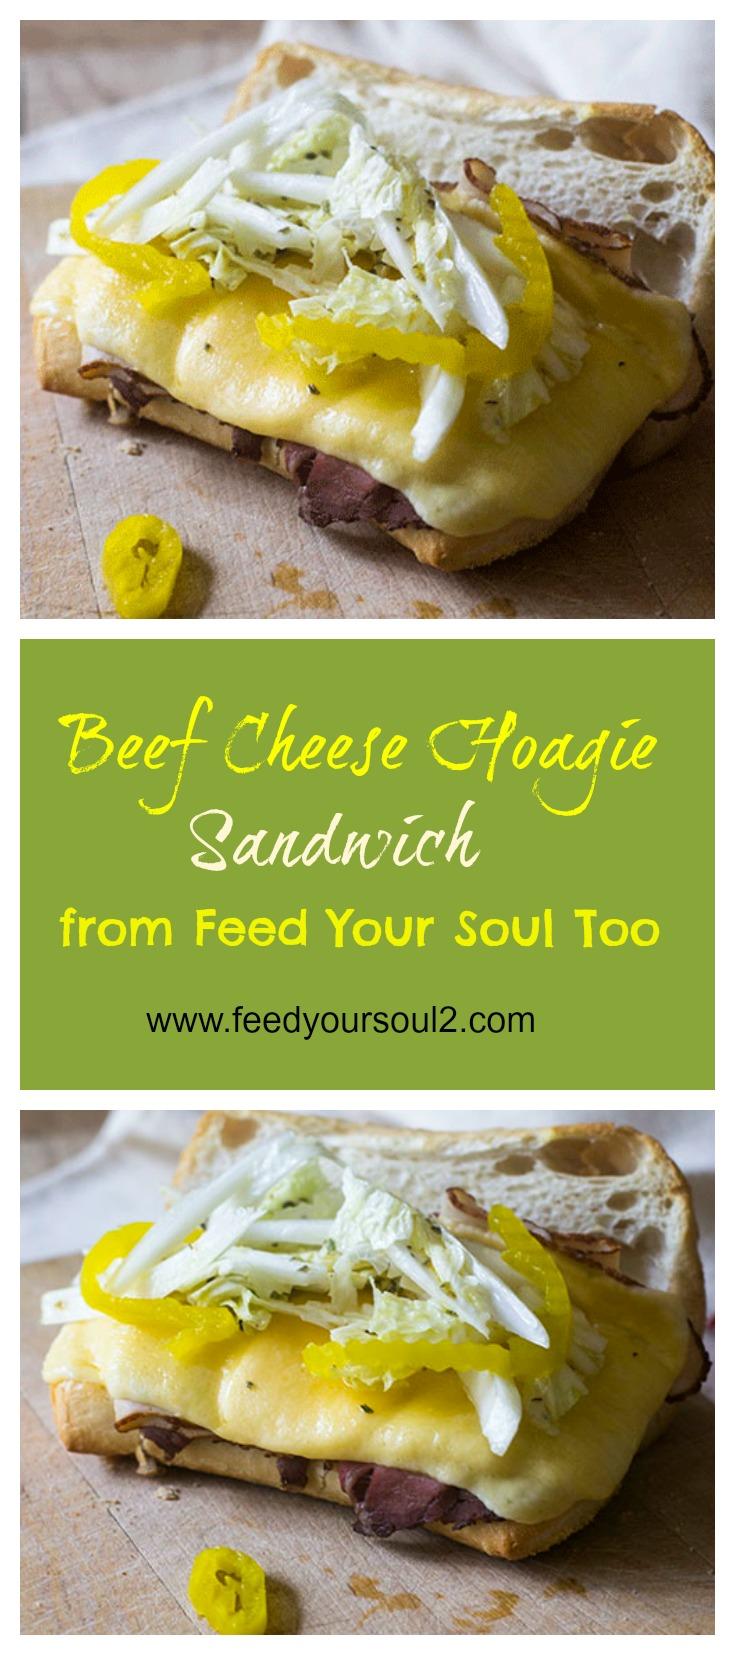 Beef Cheese Hoagie Sandwich #Sandwich #hoagie #beef #cheese | feedyoursoul2.com